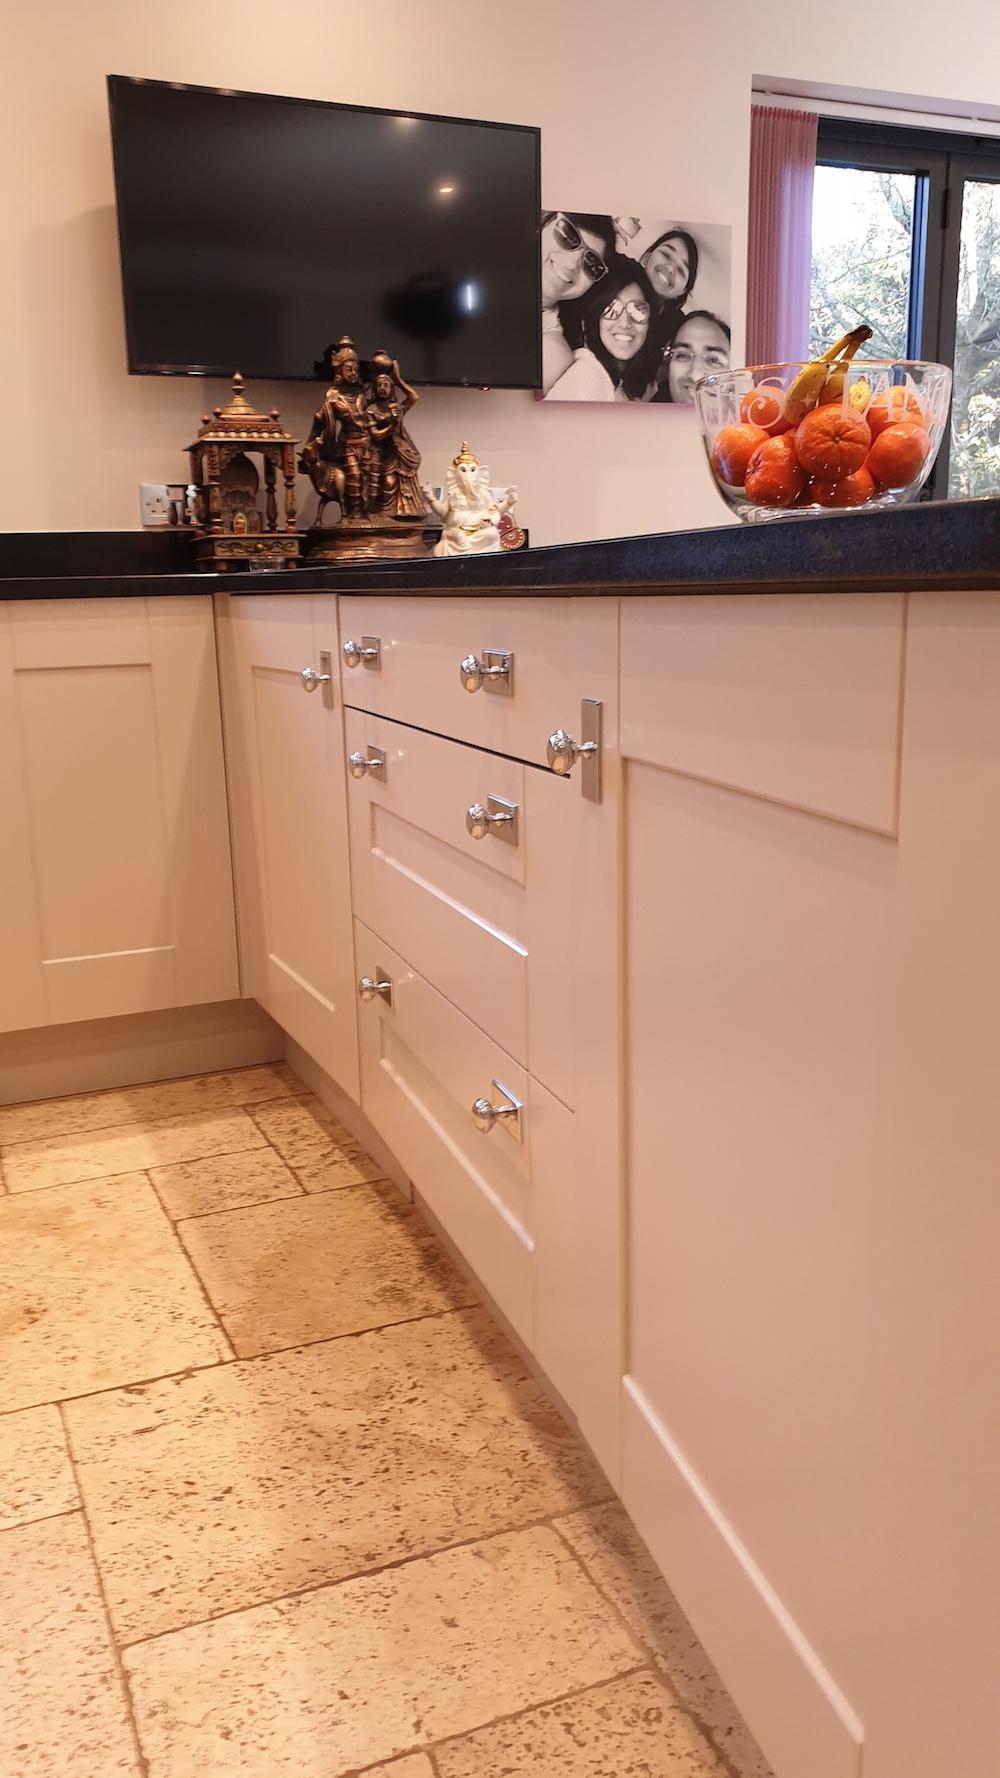 Tikkurila Helmi furniture enamel will do well in a kitchen environment